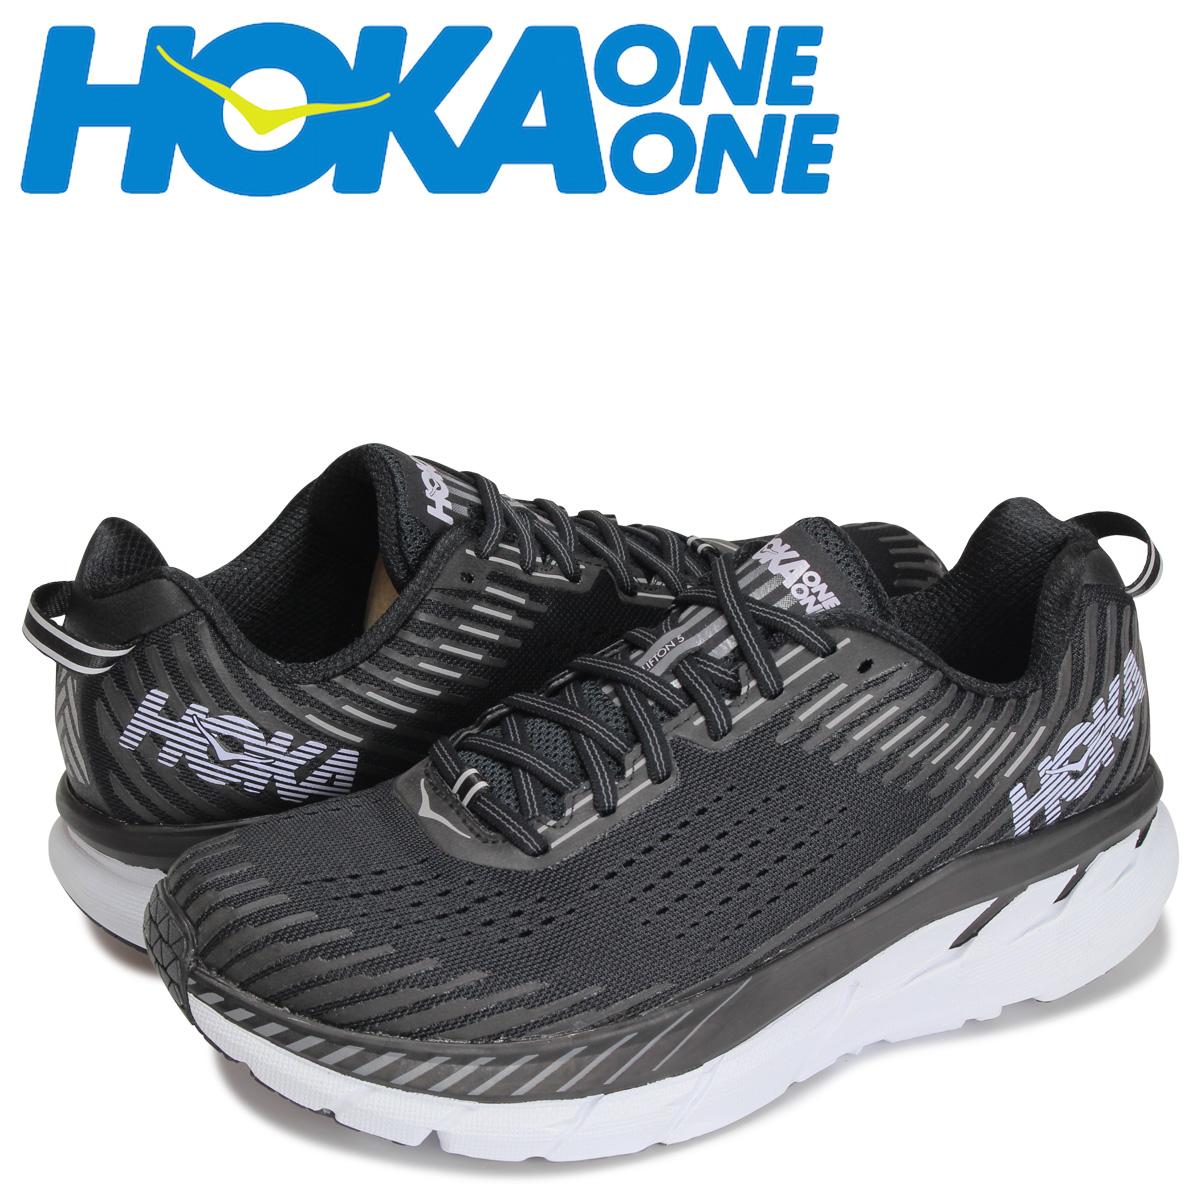 HOKA ONEONE ホカオネオネ クリフトン 5 スニーカー メンズ 厚底 CLIFTON 5 ブラック 黒 1093755